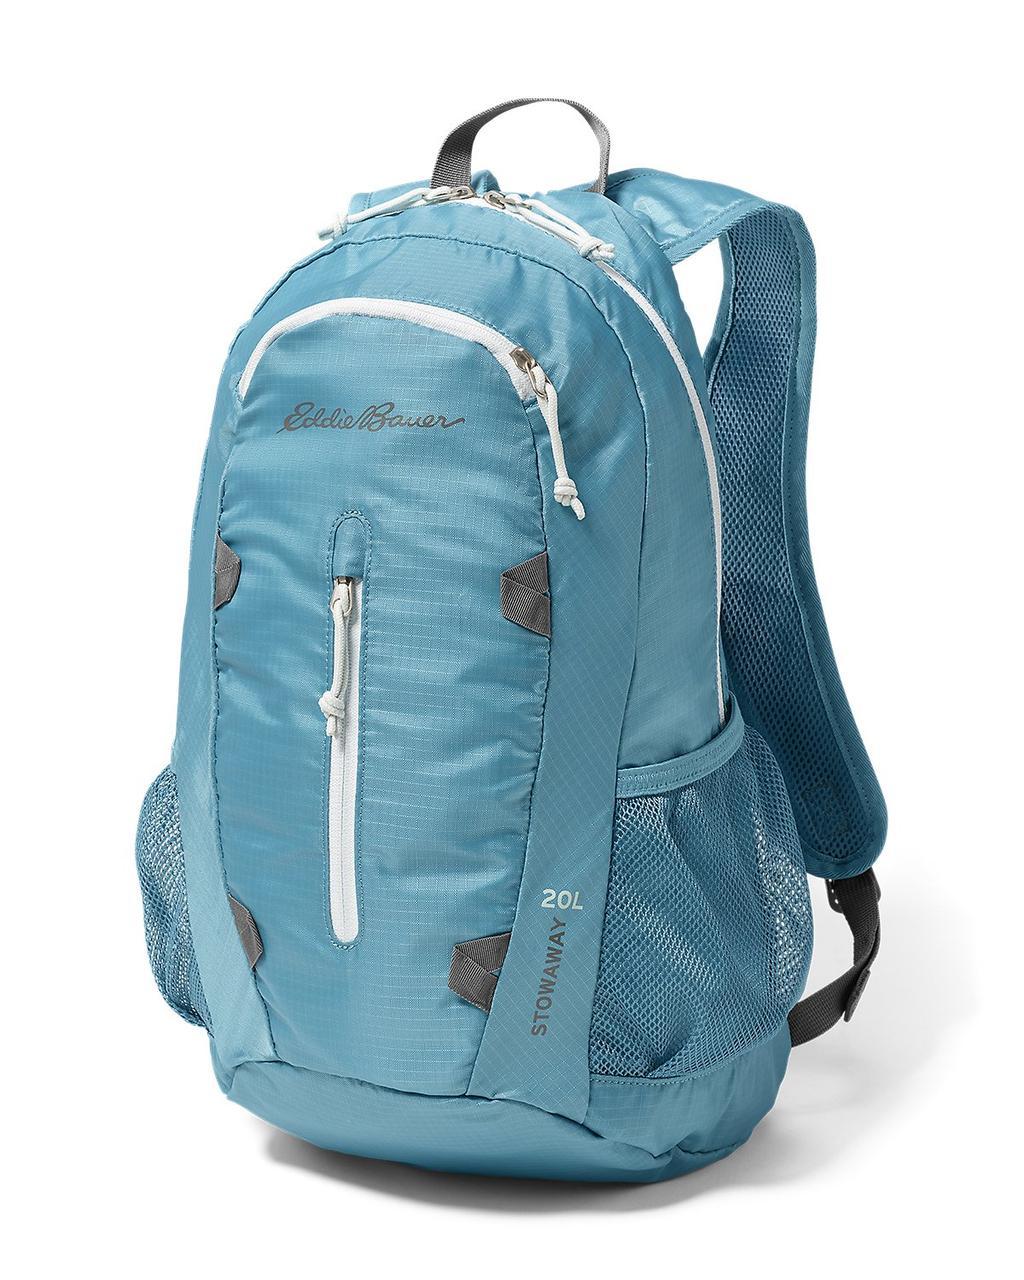 Рюкзак Eddie Bauer Stowaway 20L Backpack Rain